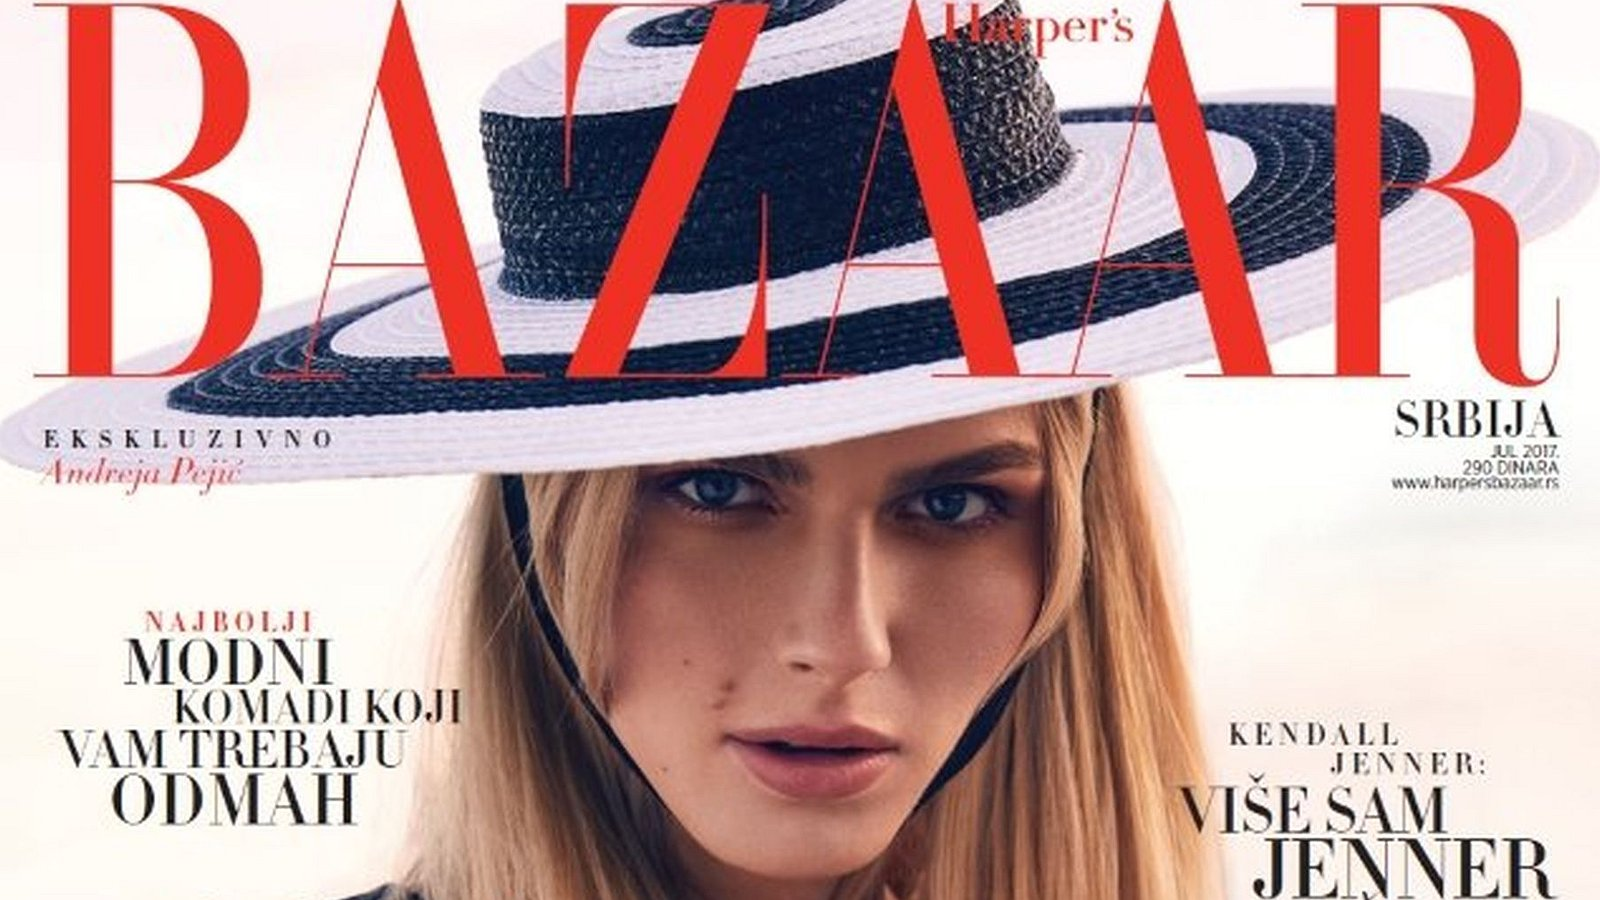 Transgender model op de cover van Servisch fashionblad